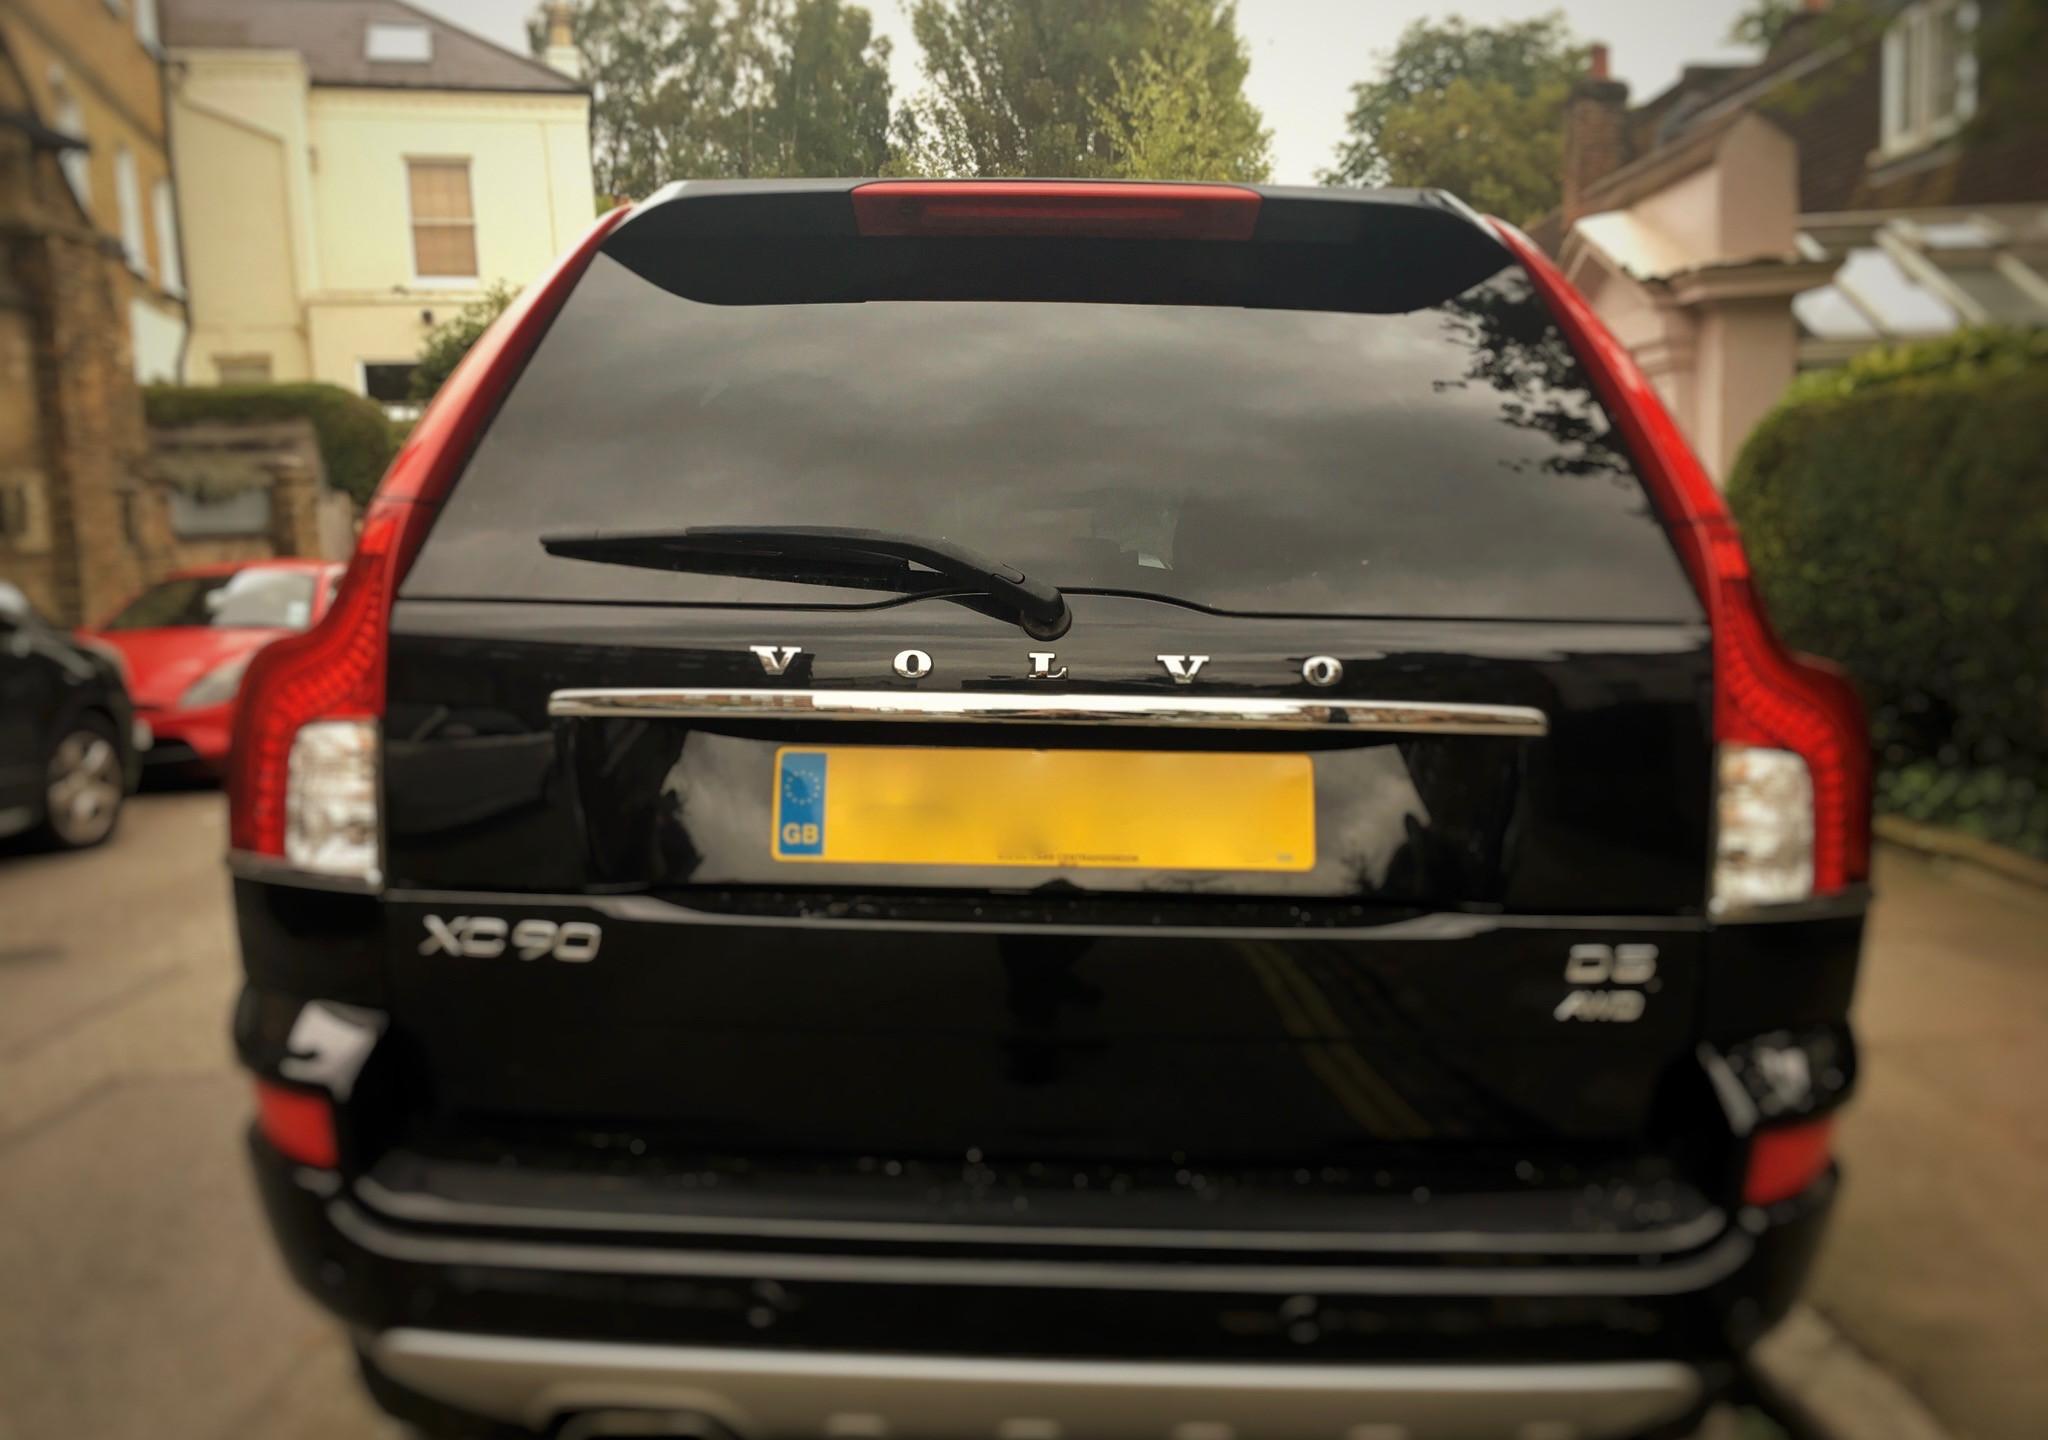 Volvo Dashcam Installer Hampstead Heath London, Goluk T1 T3